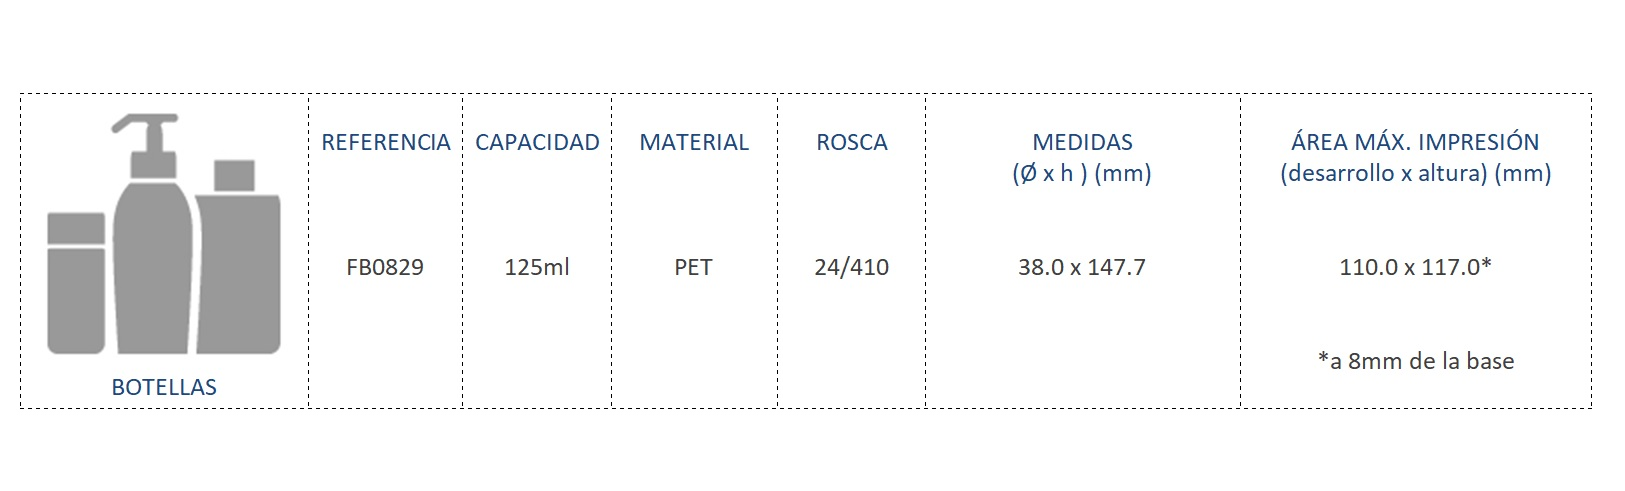 Cuadro de materiales botella FB0829